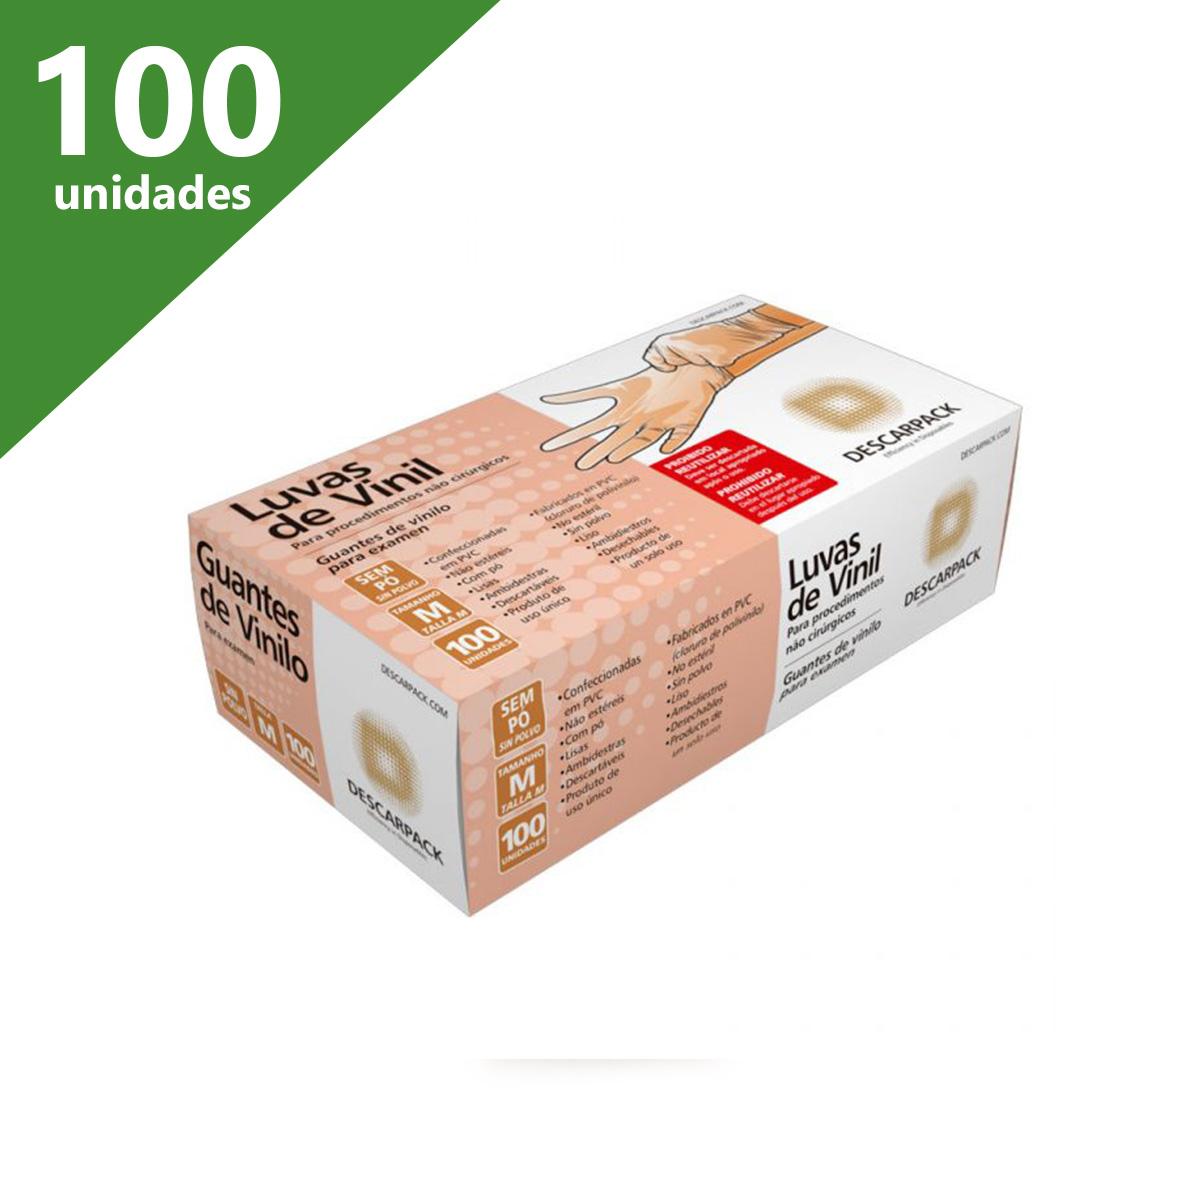 LUVA DE PROCEDIMENTO DE VINIL M SEM PÓ (C/100) - DESCARPACK